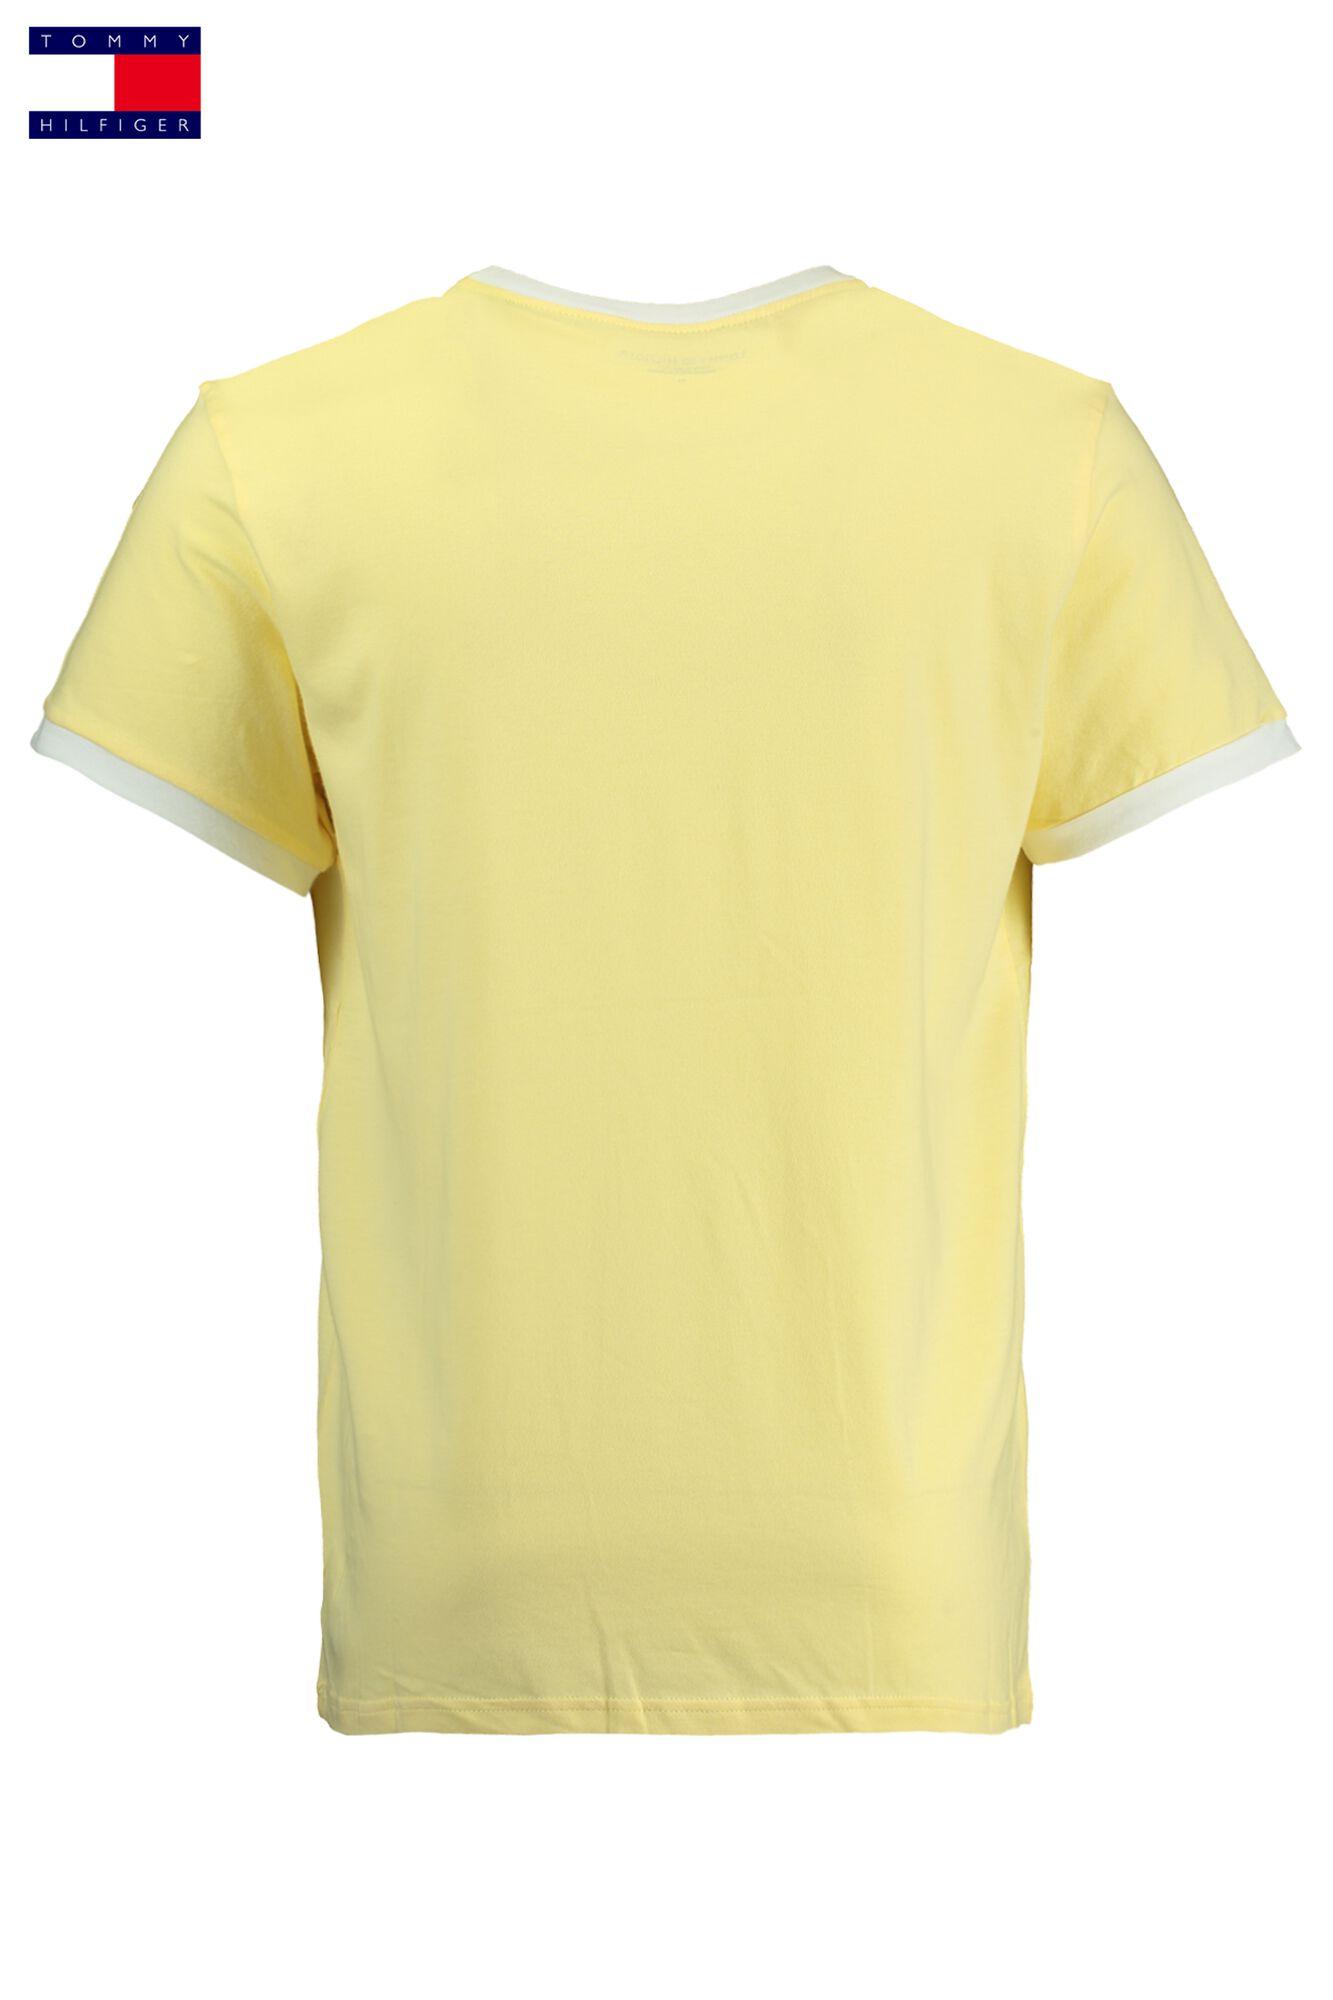 46205b4d Men T-shirt Tommy Hilfiger Logo Flag Yellow Buy Online